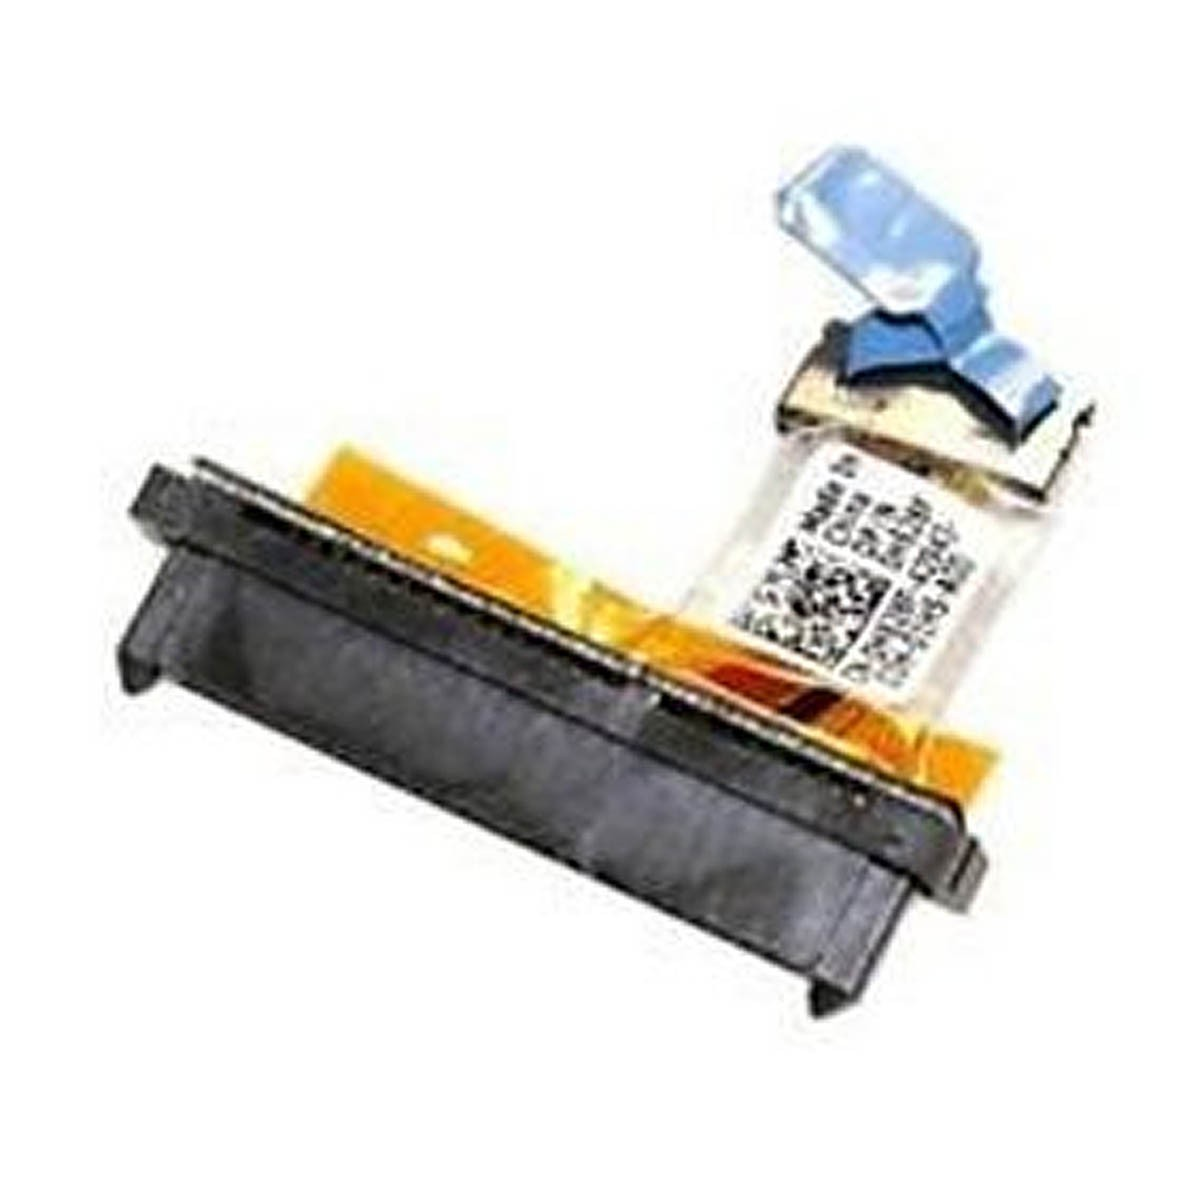 Conector HD SATA Notebook Dell Studio XPS 1340 1640 H628F PN:0H628F - Retirado